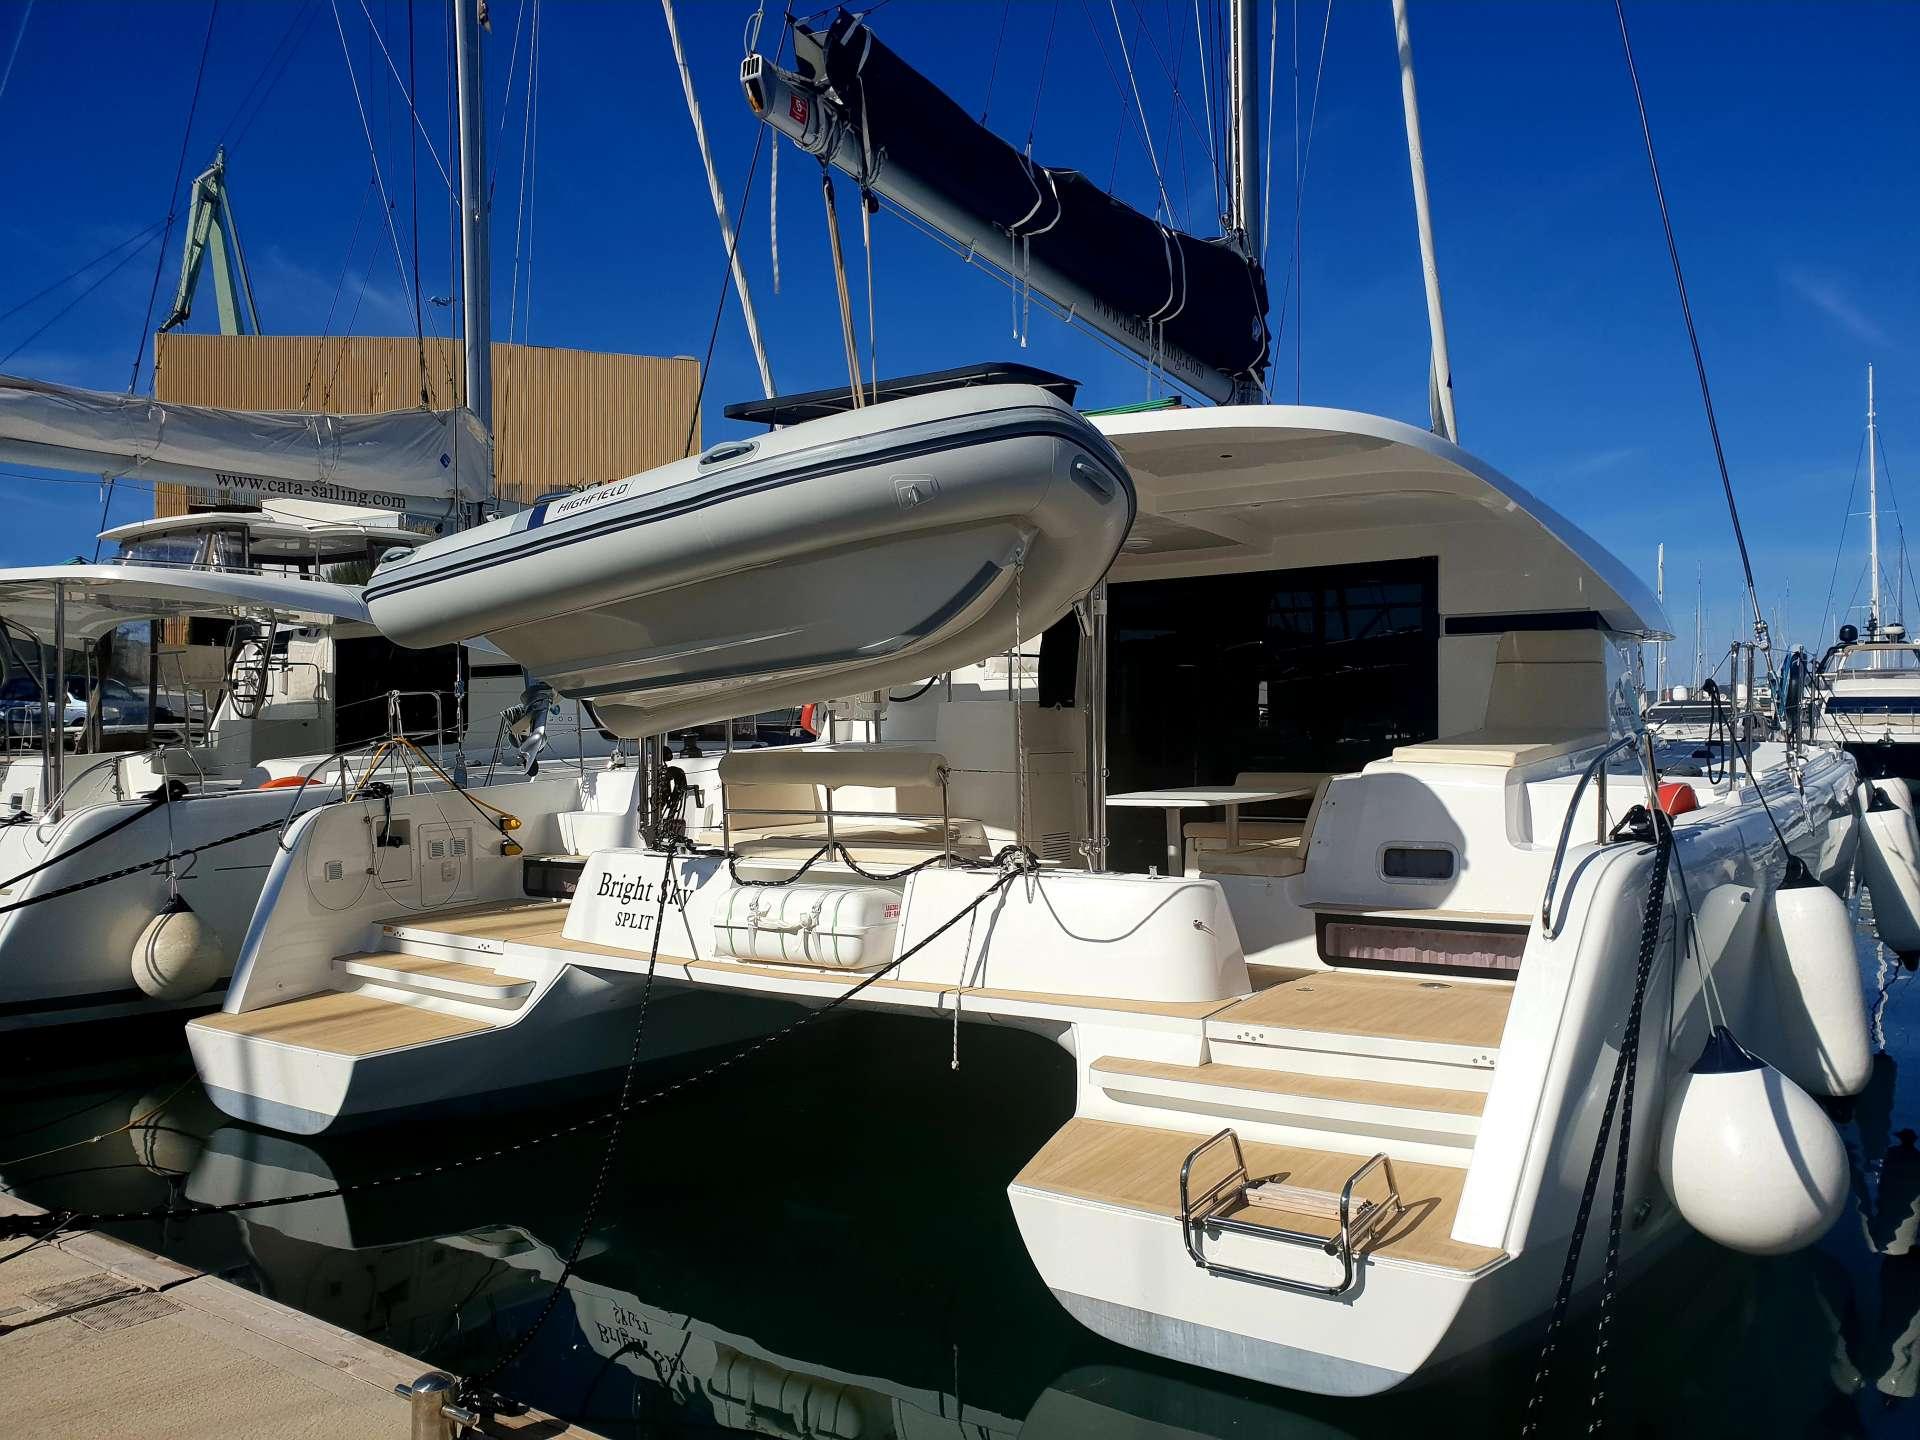 Main image of Bright Sky yacht